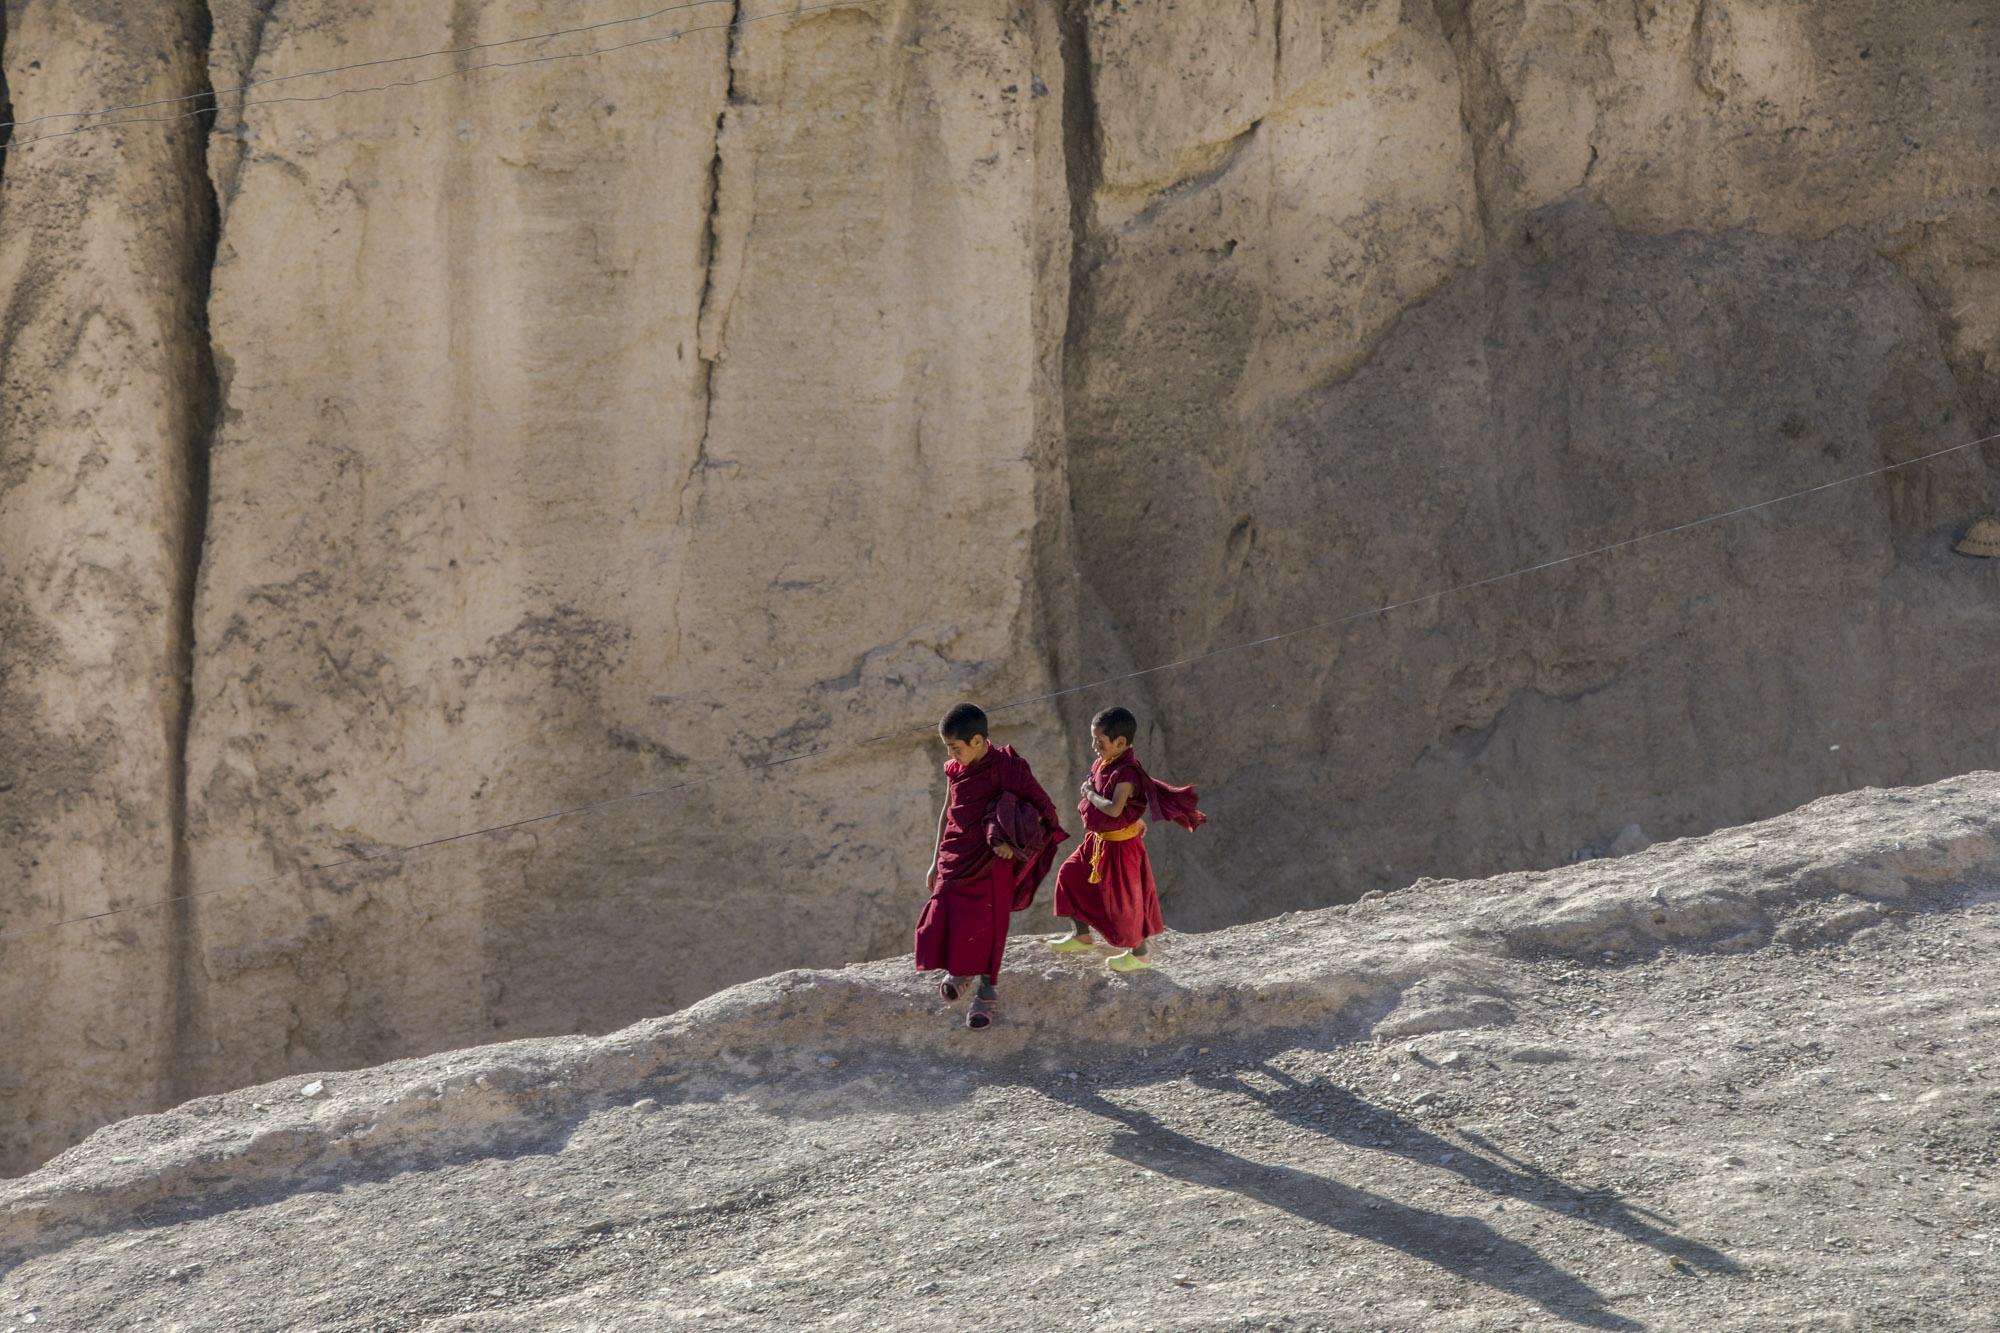 Young monks from Yuru gompa, Lamayuru, Ladakh